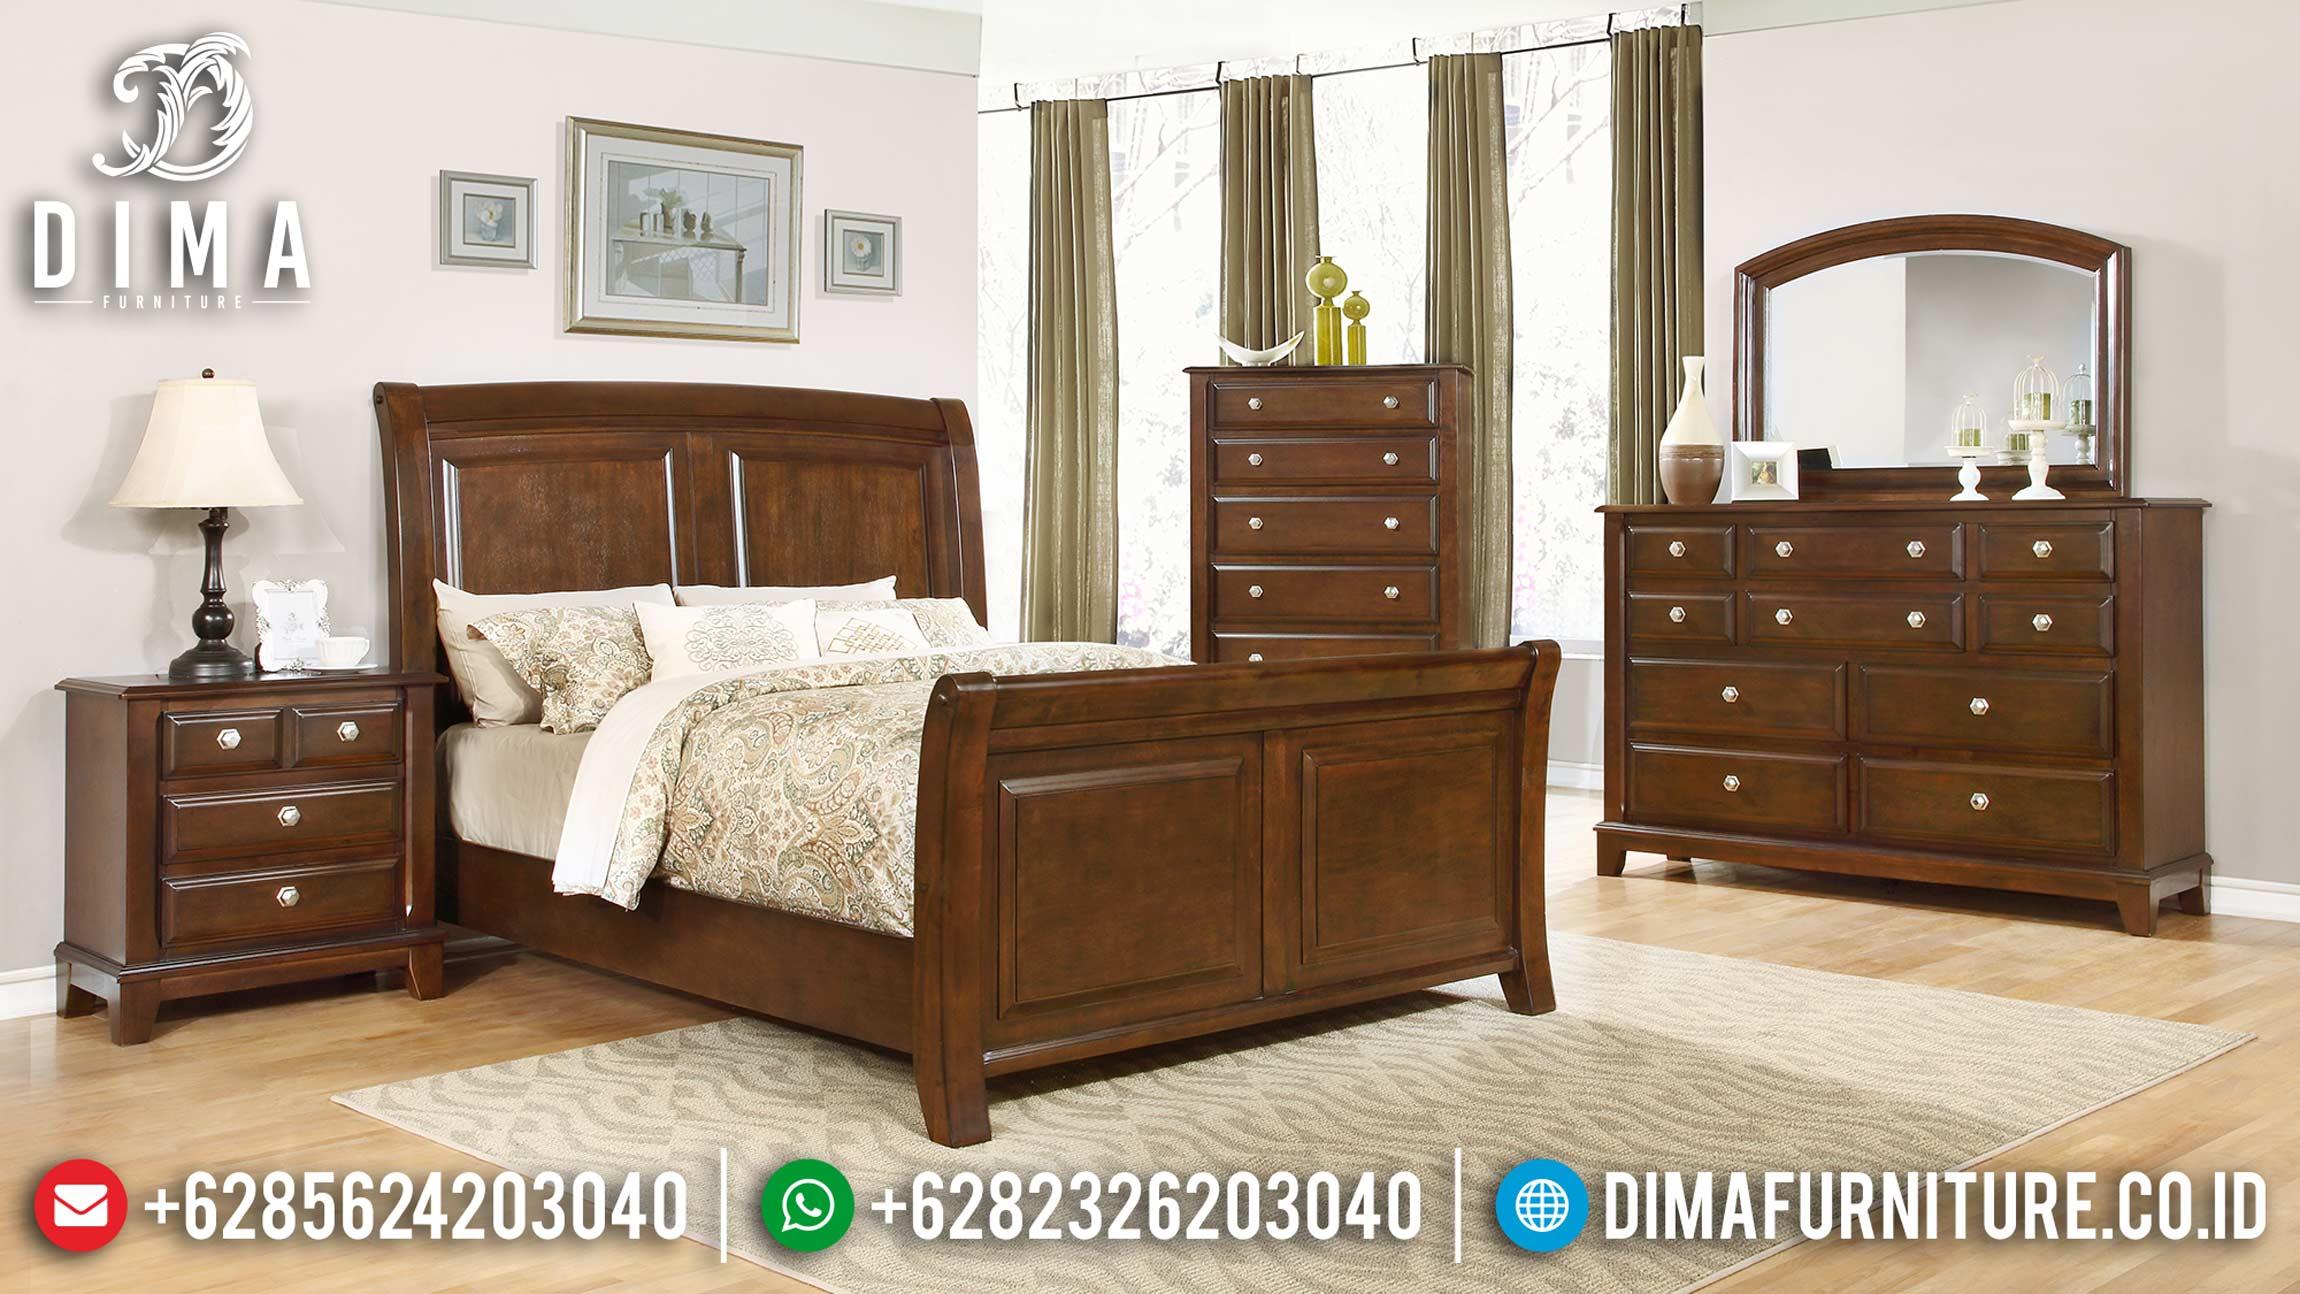 Set Tempat Tidur Minimalis Modern Kayu Jati Terbaru ST-0822